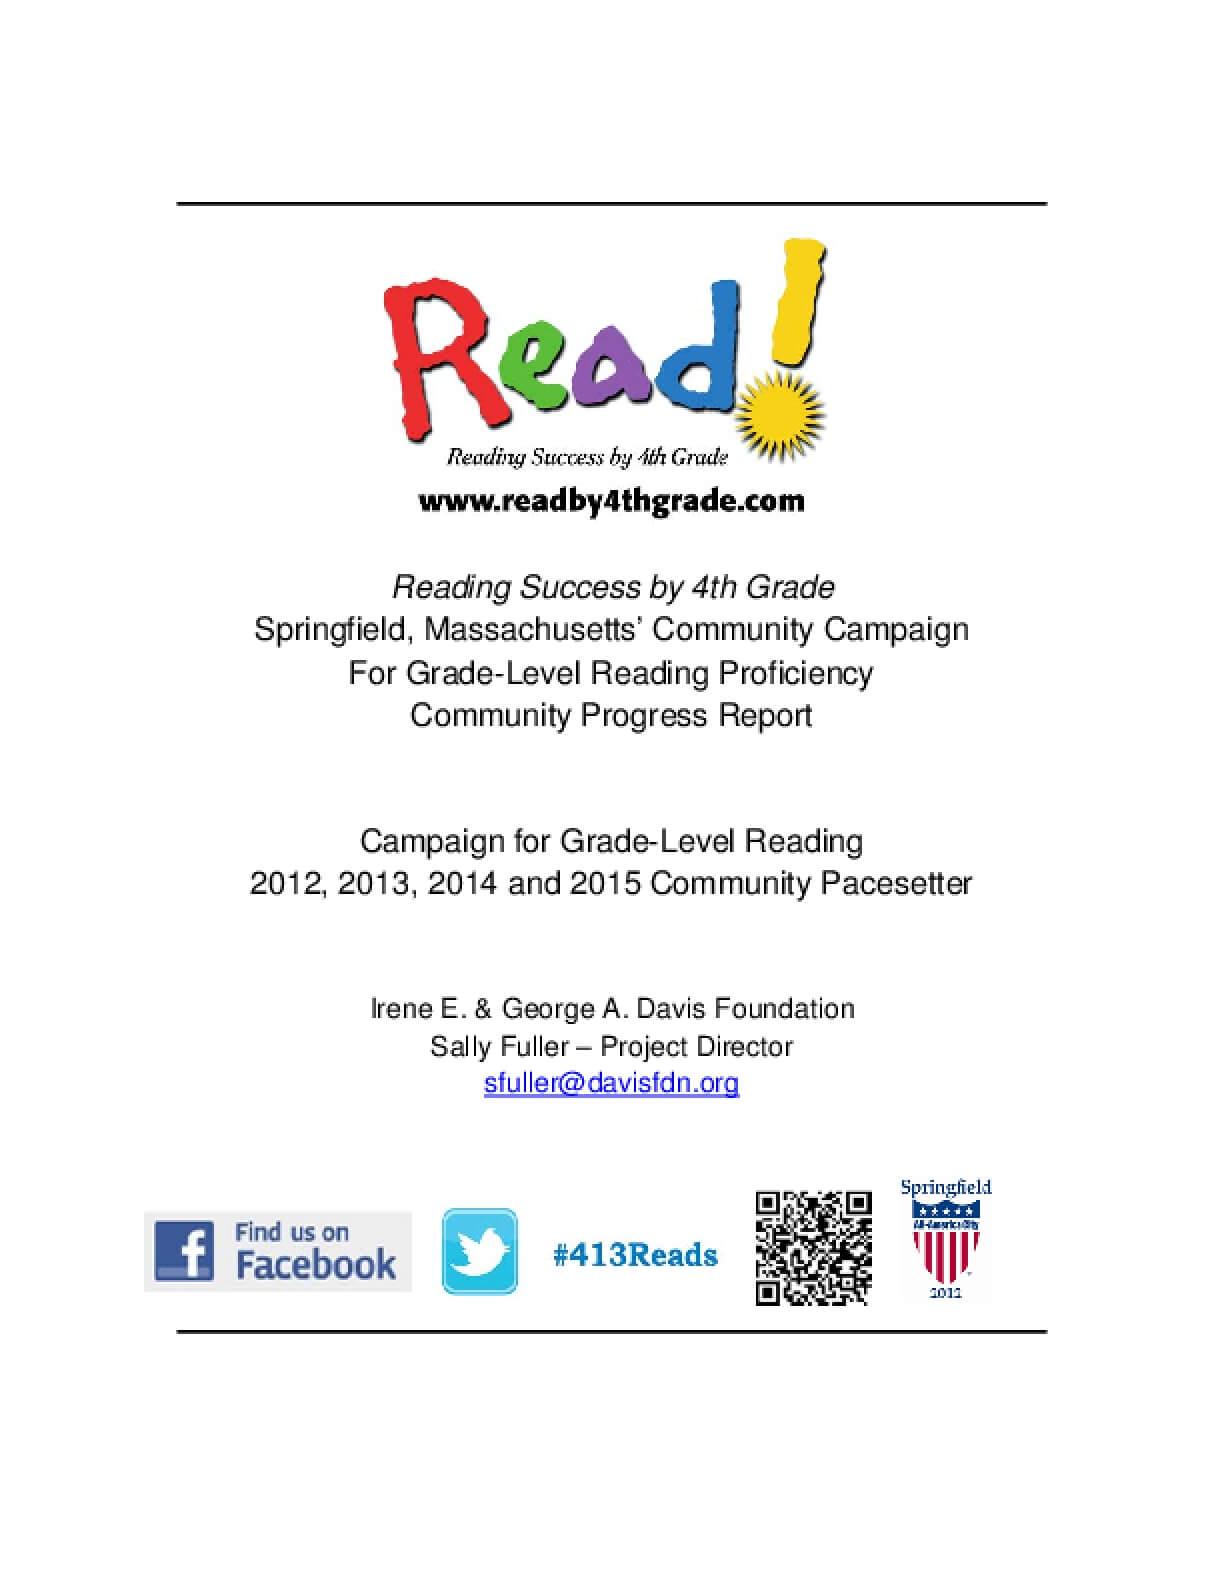 Read! Reading Success by 4th Grade: Community Progress Report